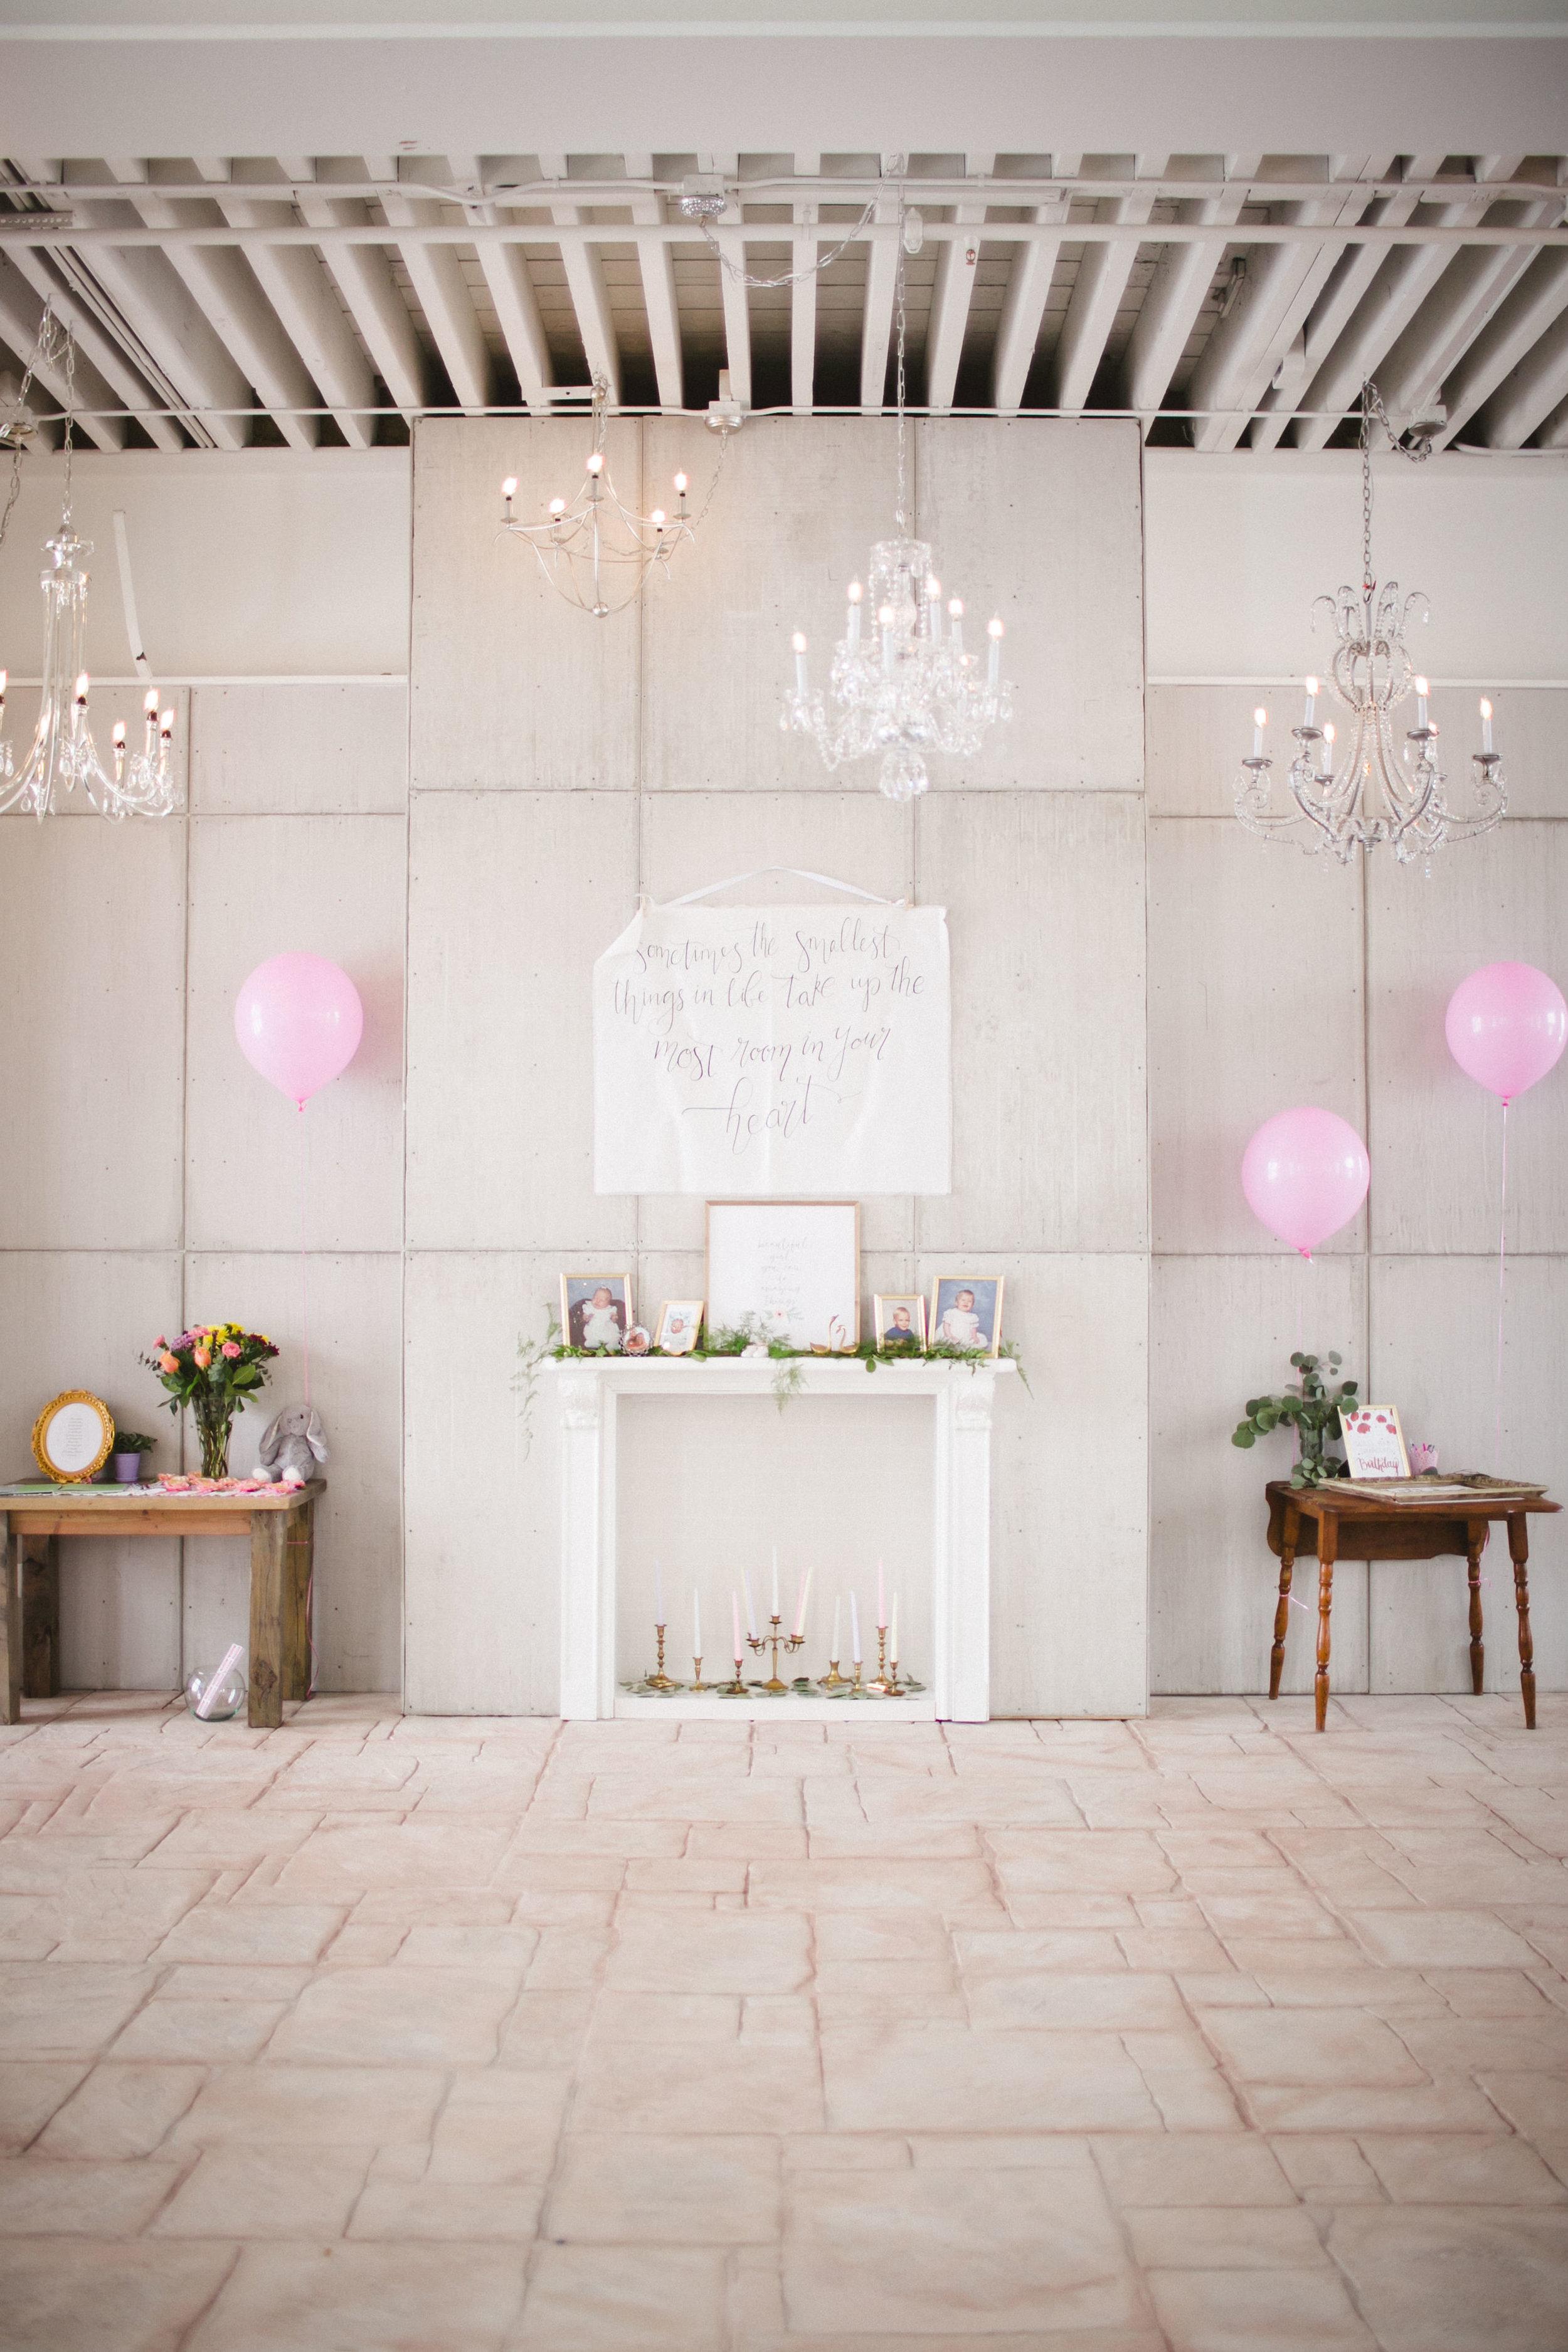 by Aimee Jobe Luminary Fern Brainerd Baby Shower Space-19.jpg